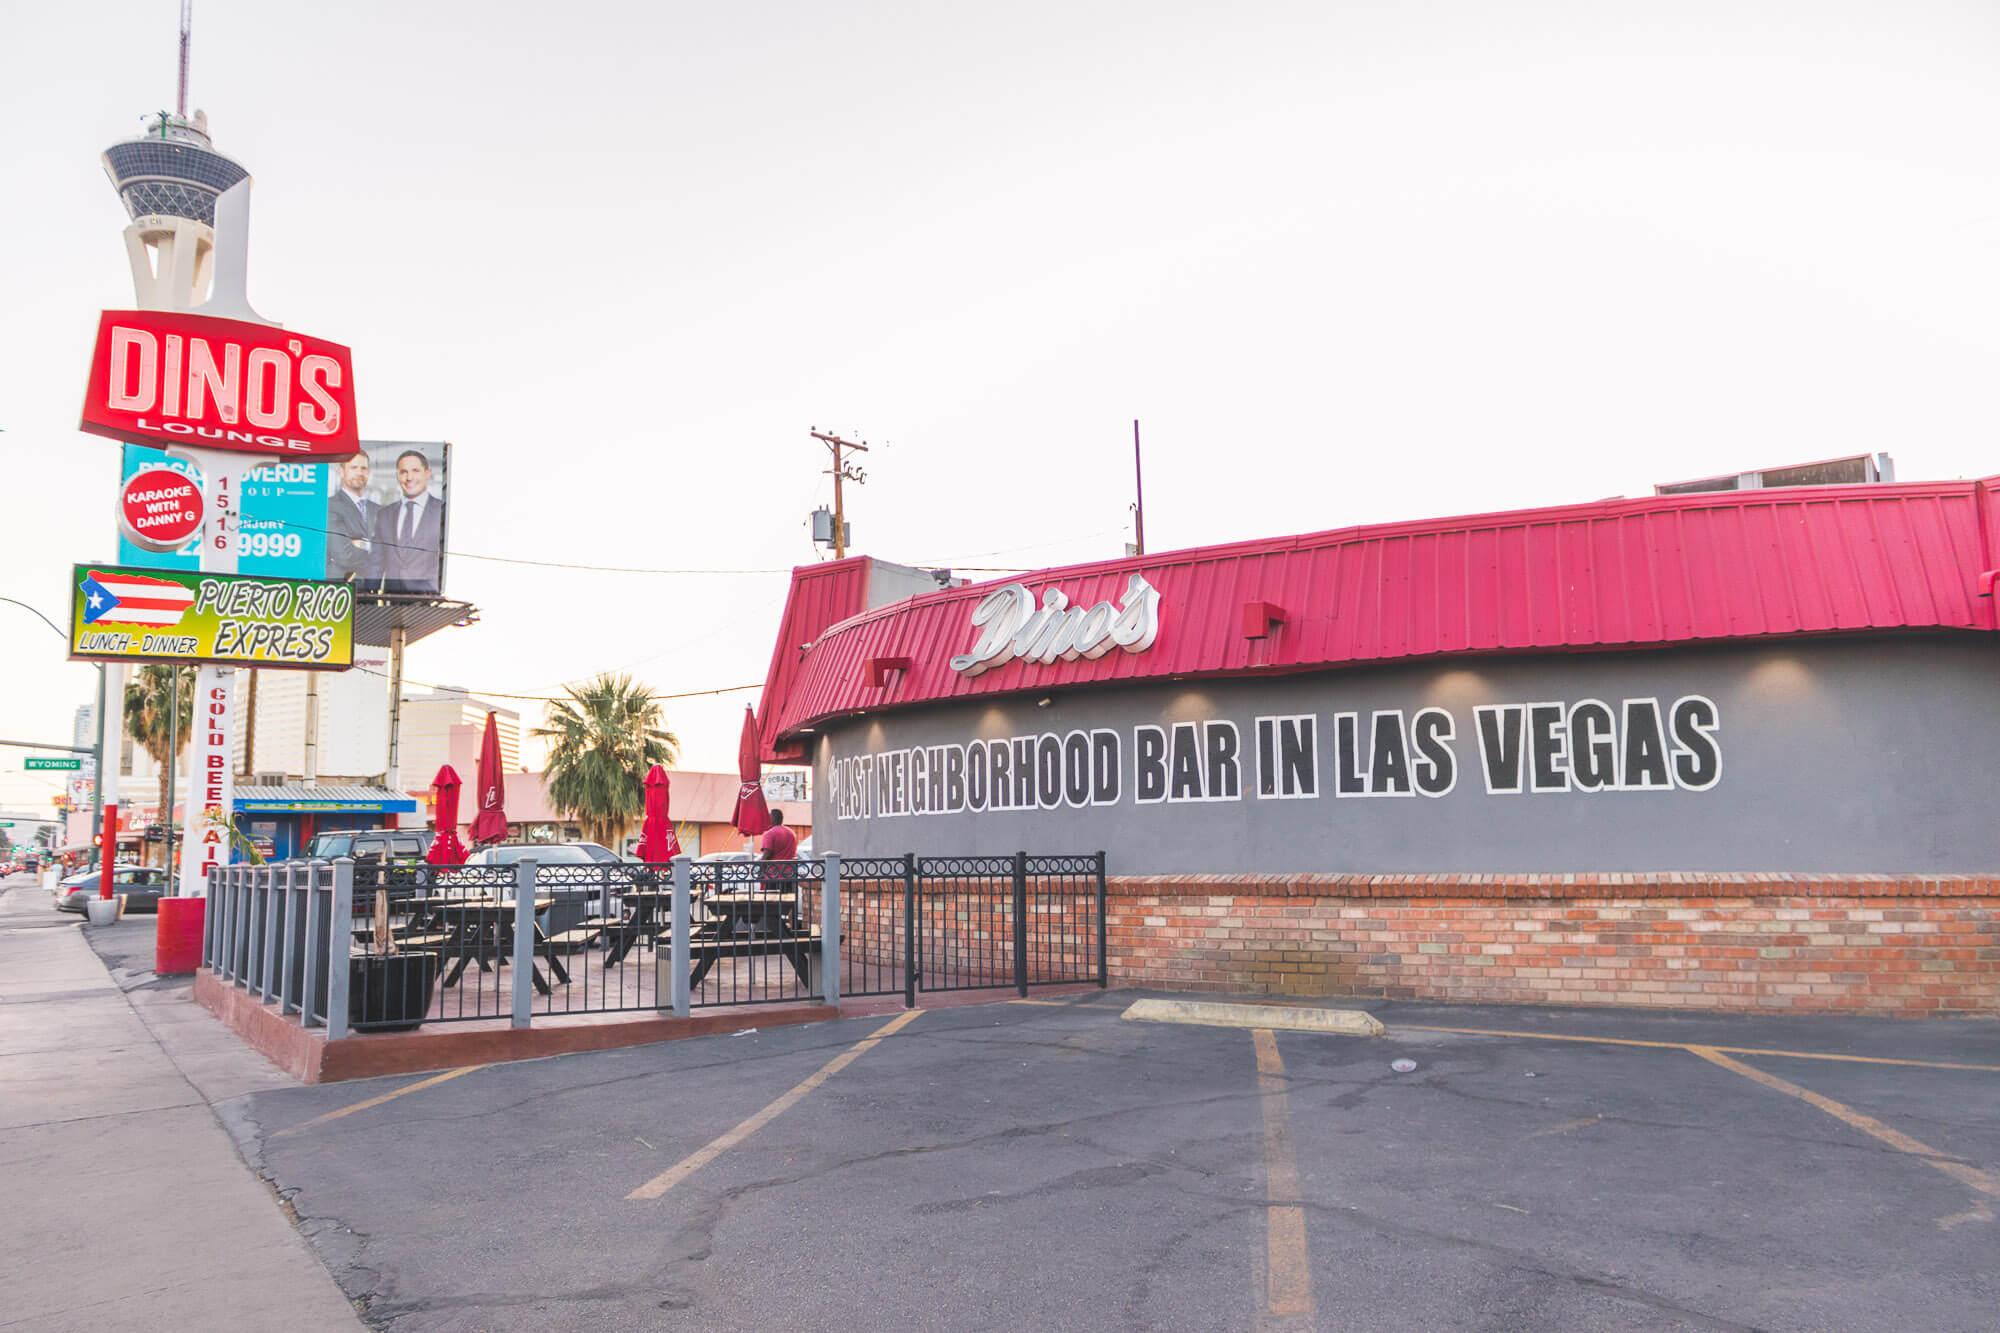 Dinou0027s Lounge Is One Of The Best Dive Bars In Las Vegas